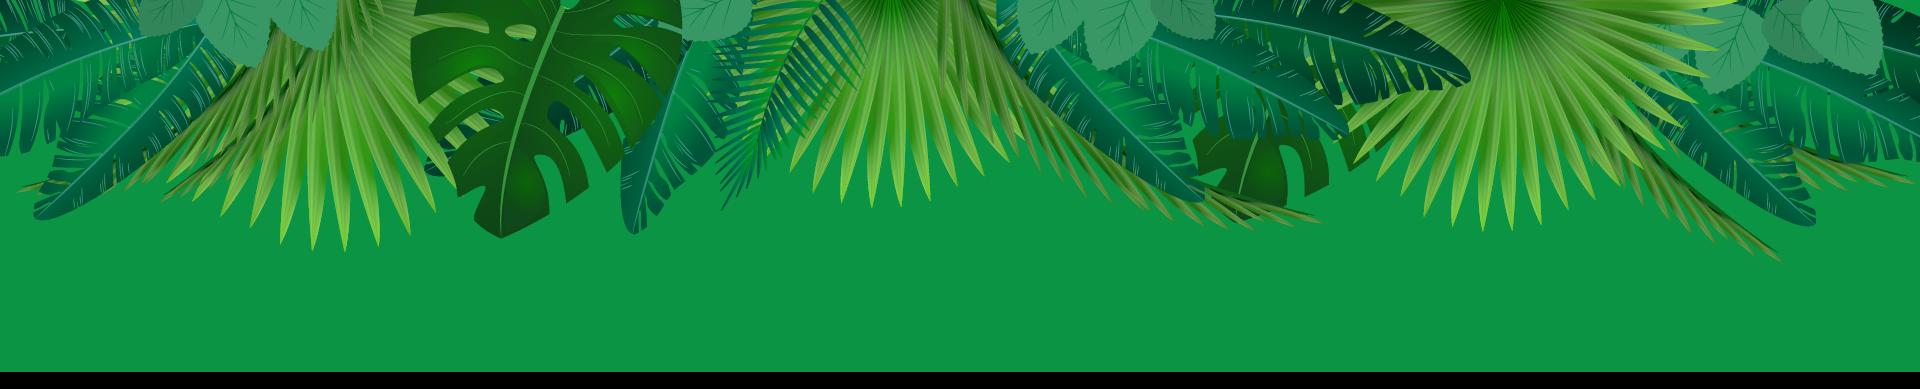 Palm children s dental. Jungle border png